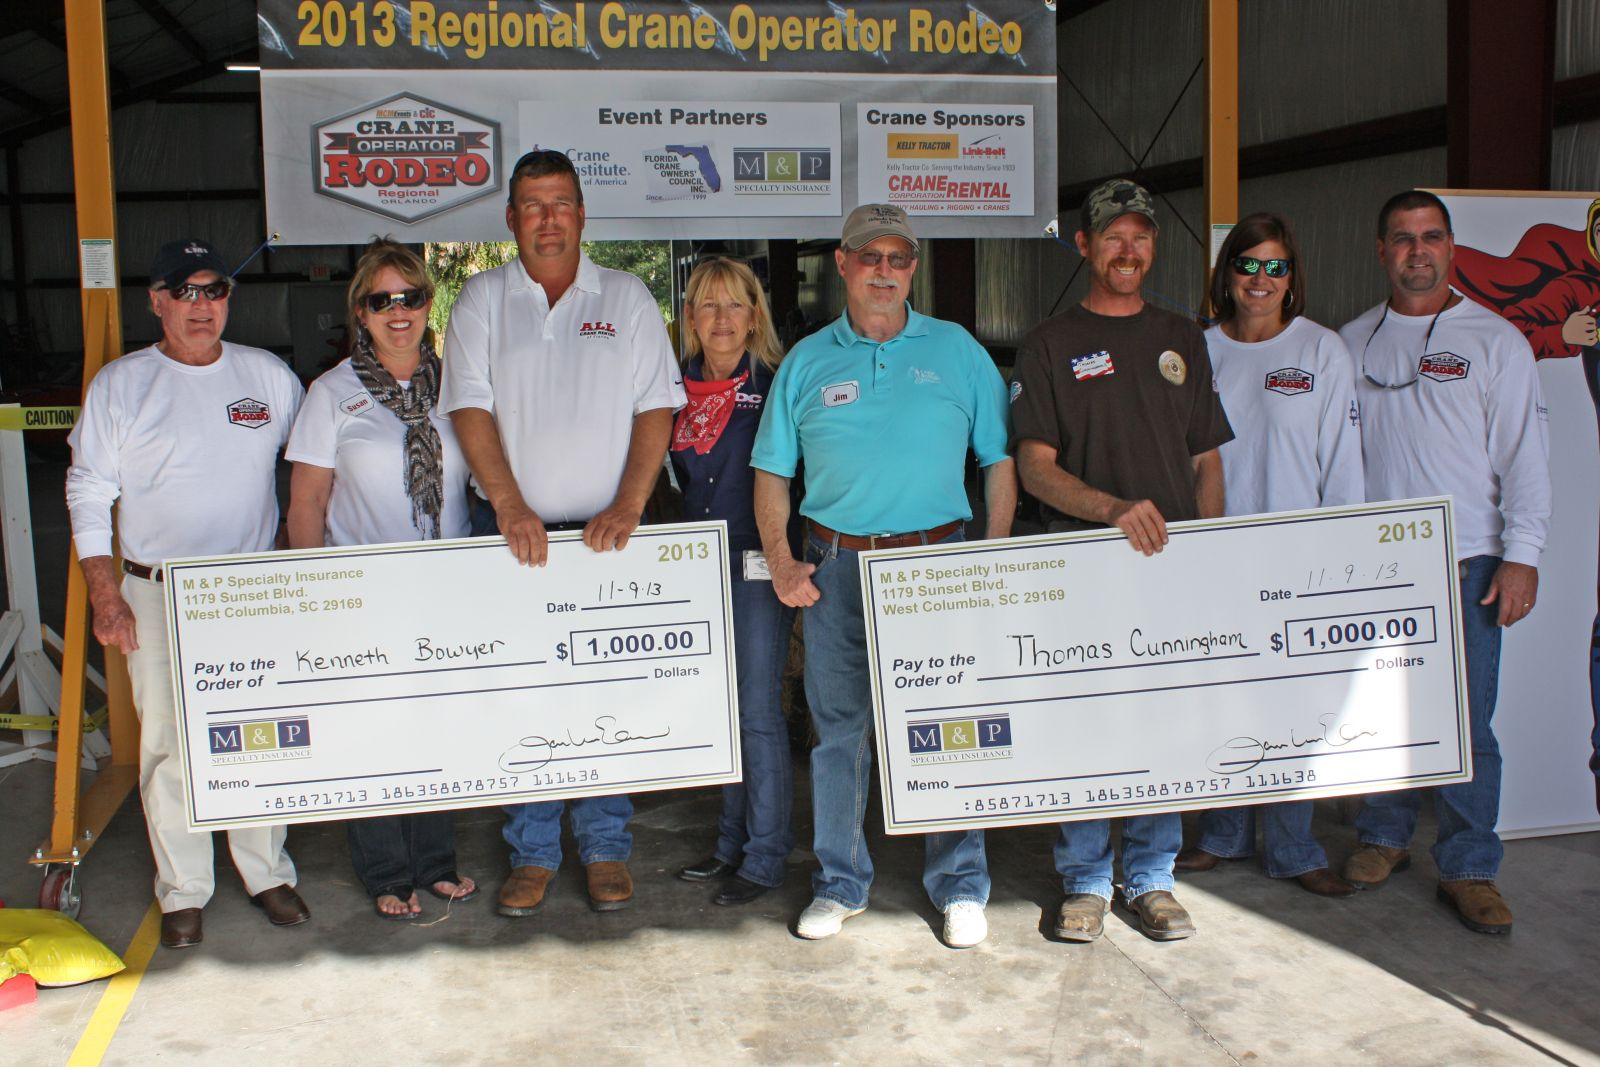 Central Florida Crane Operators Go Head-to-Head at Regional Skills Competition